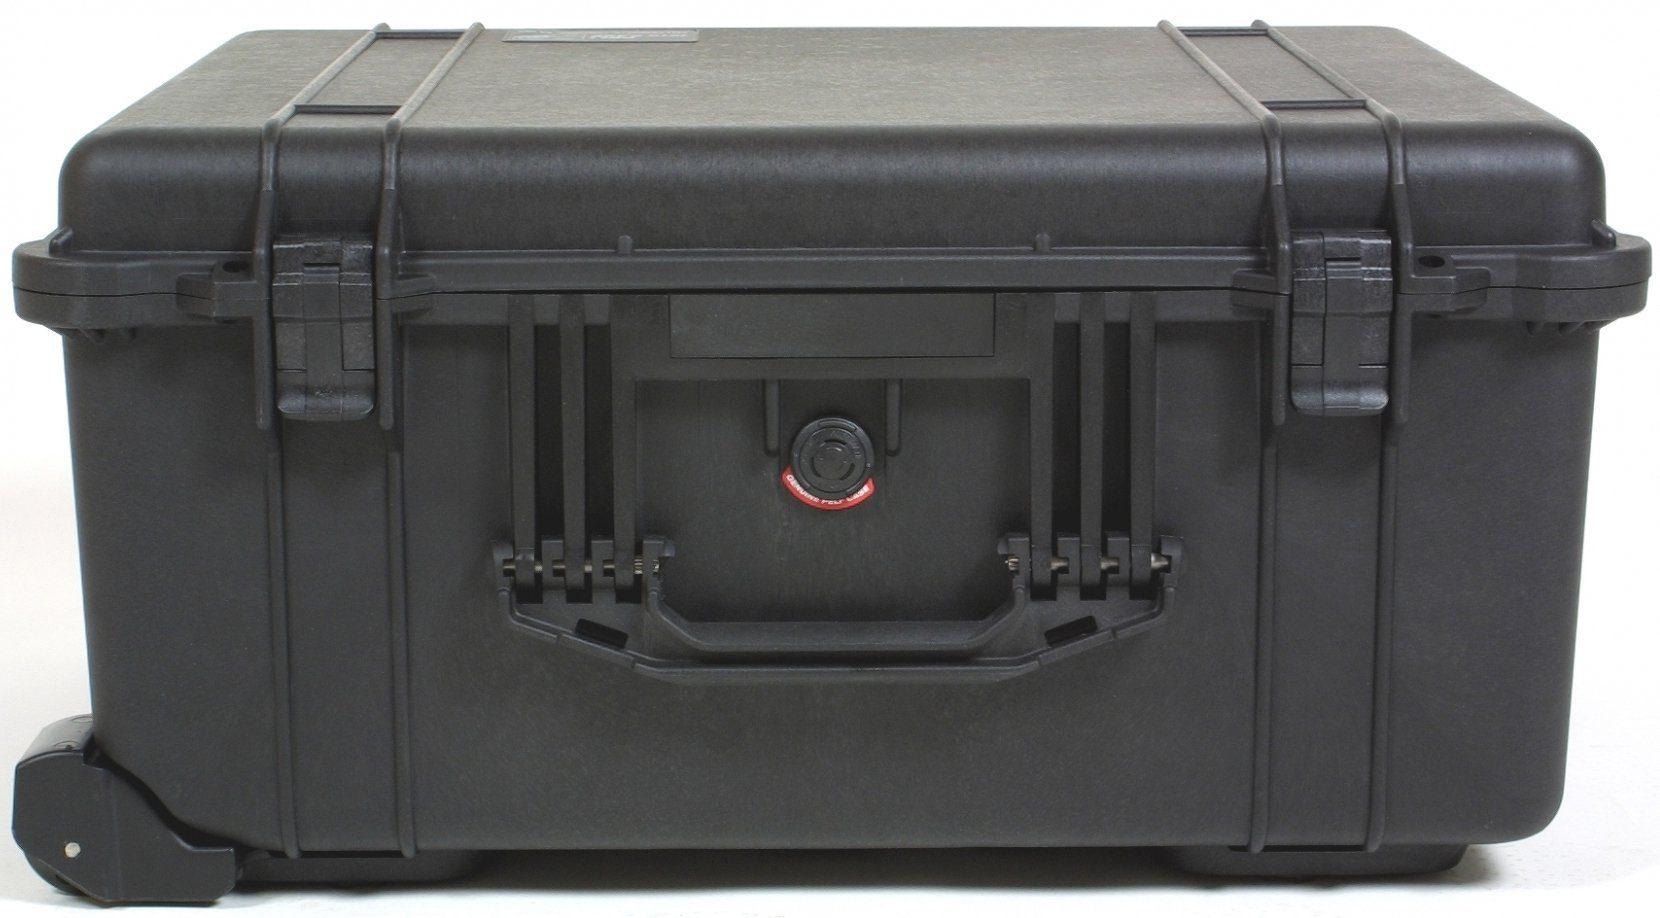 Peli Campingtruhe & -Kiste »1610 ohne Schaumeinsatz«